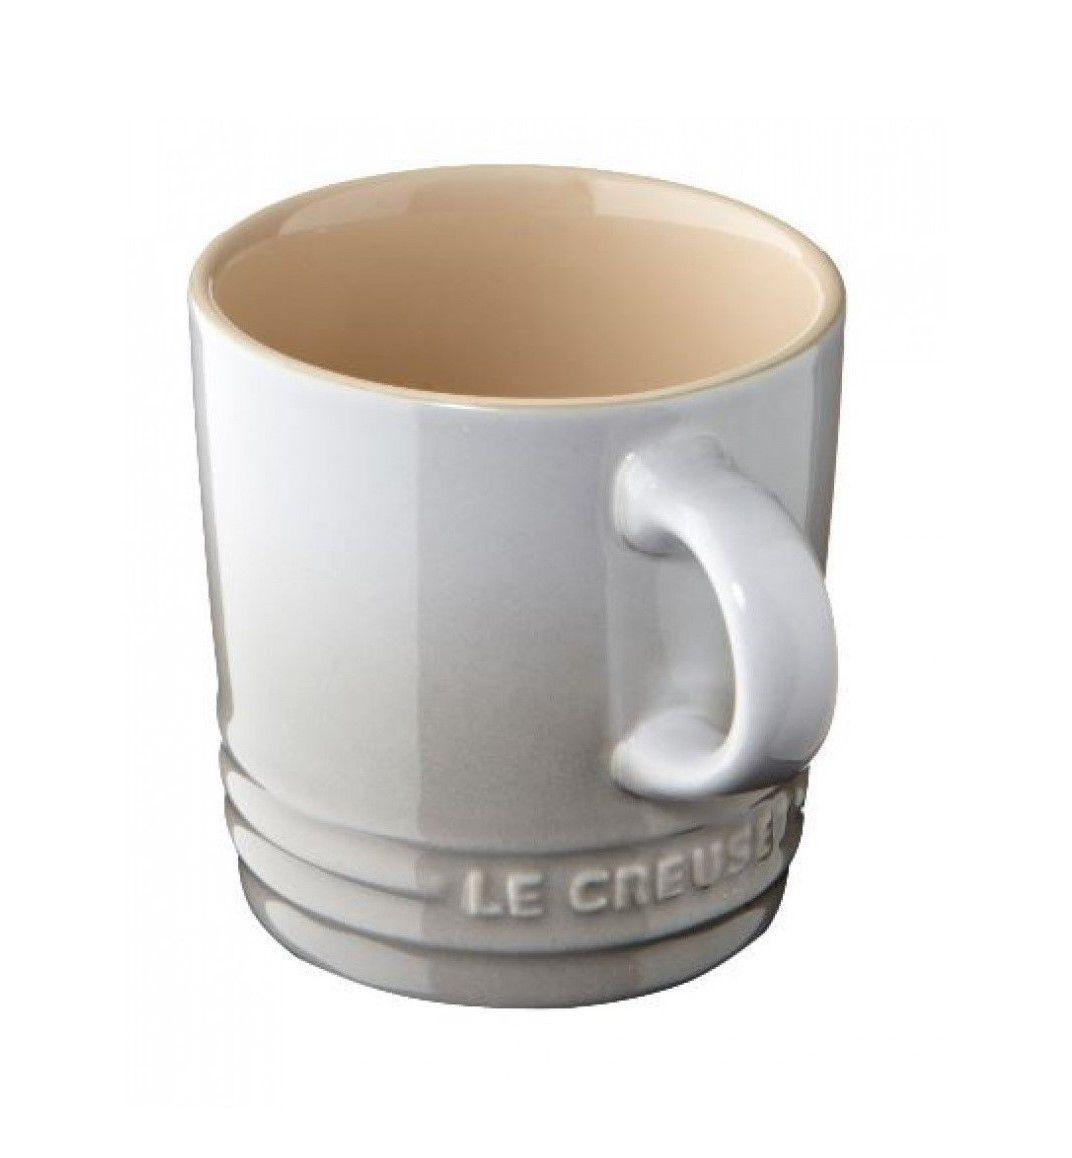 Le Creuset theemok grijs 35 cl